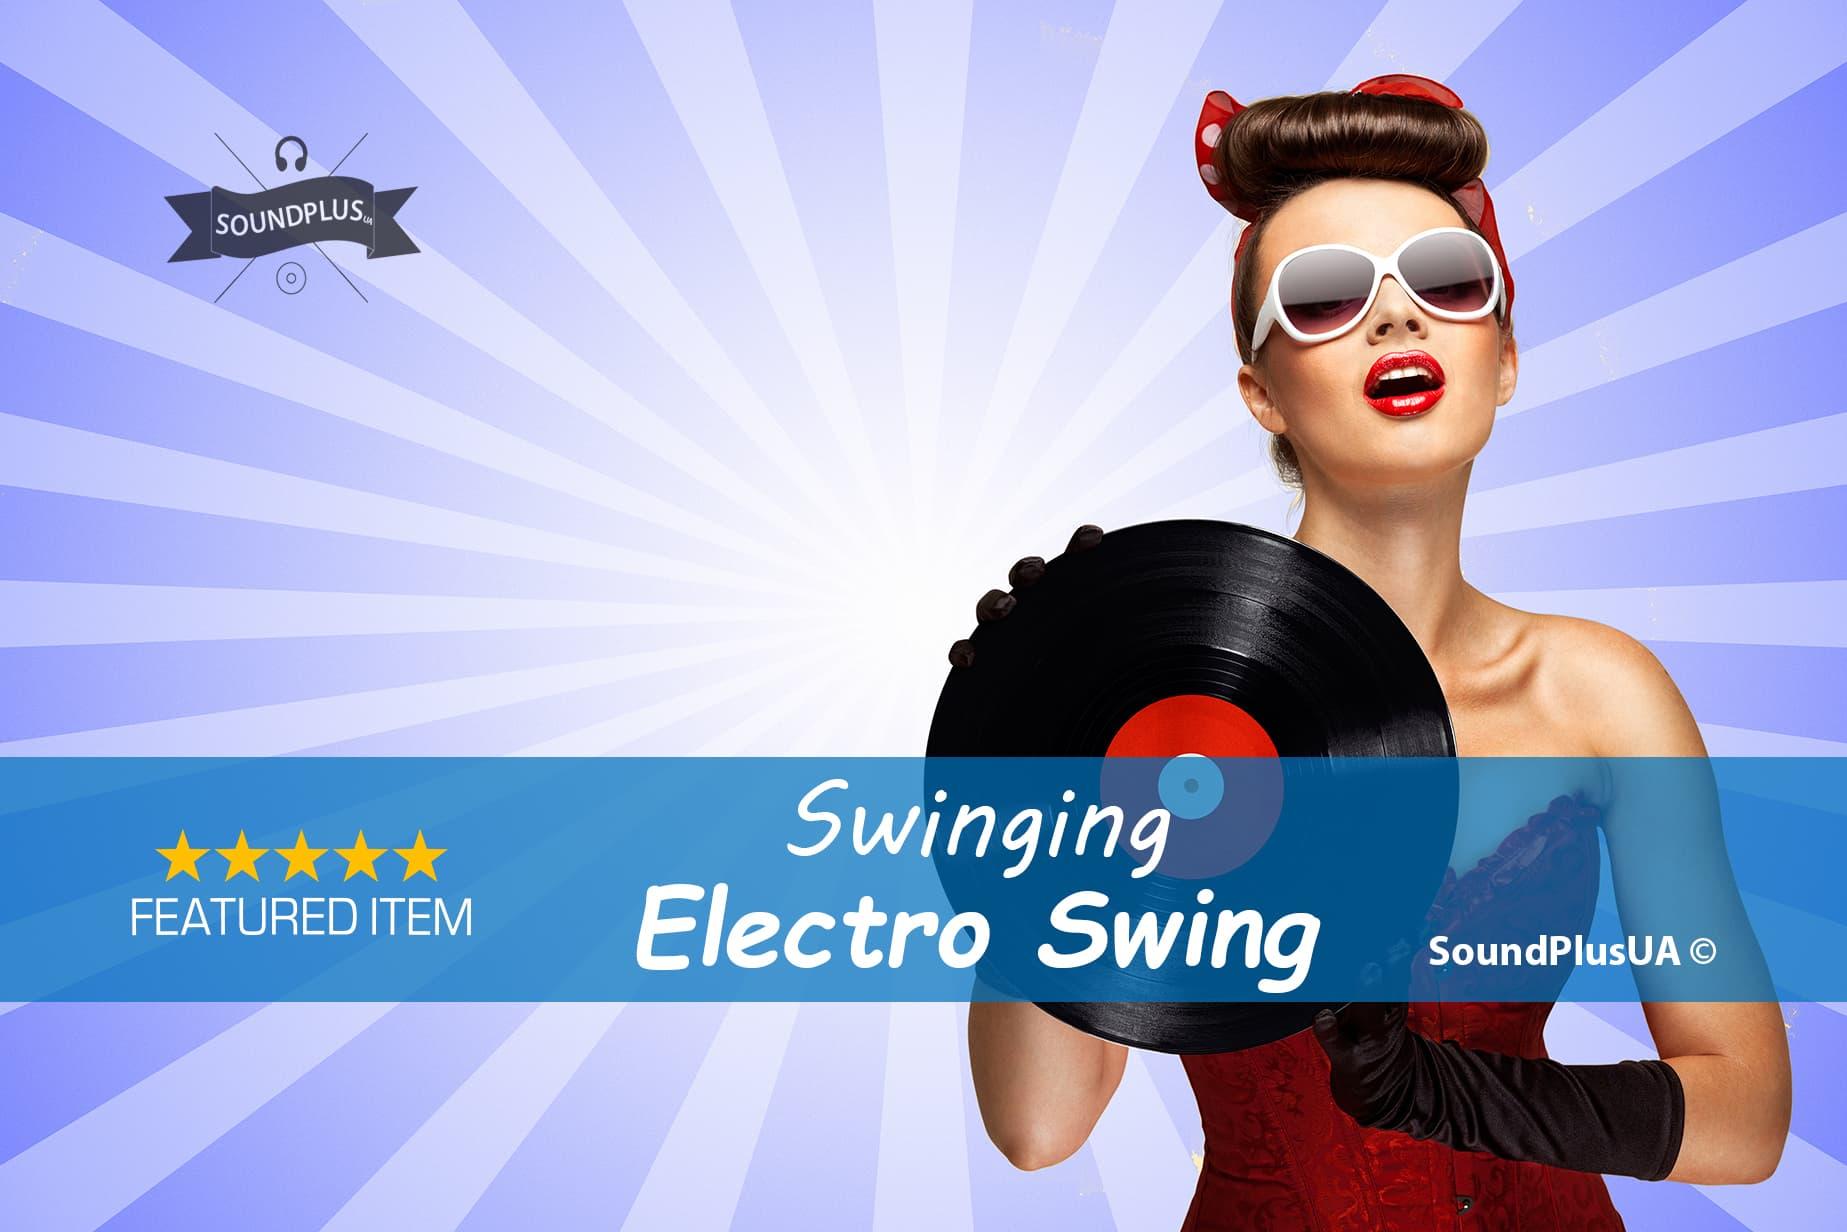 Swinging Electro Swing Music